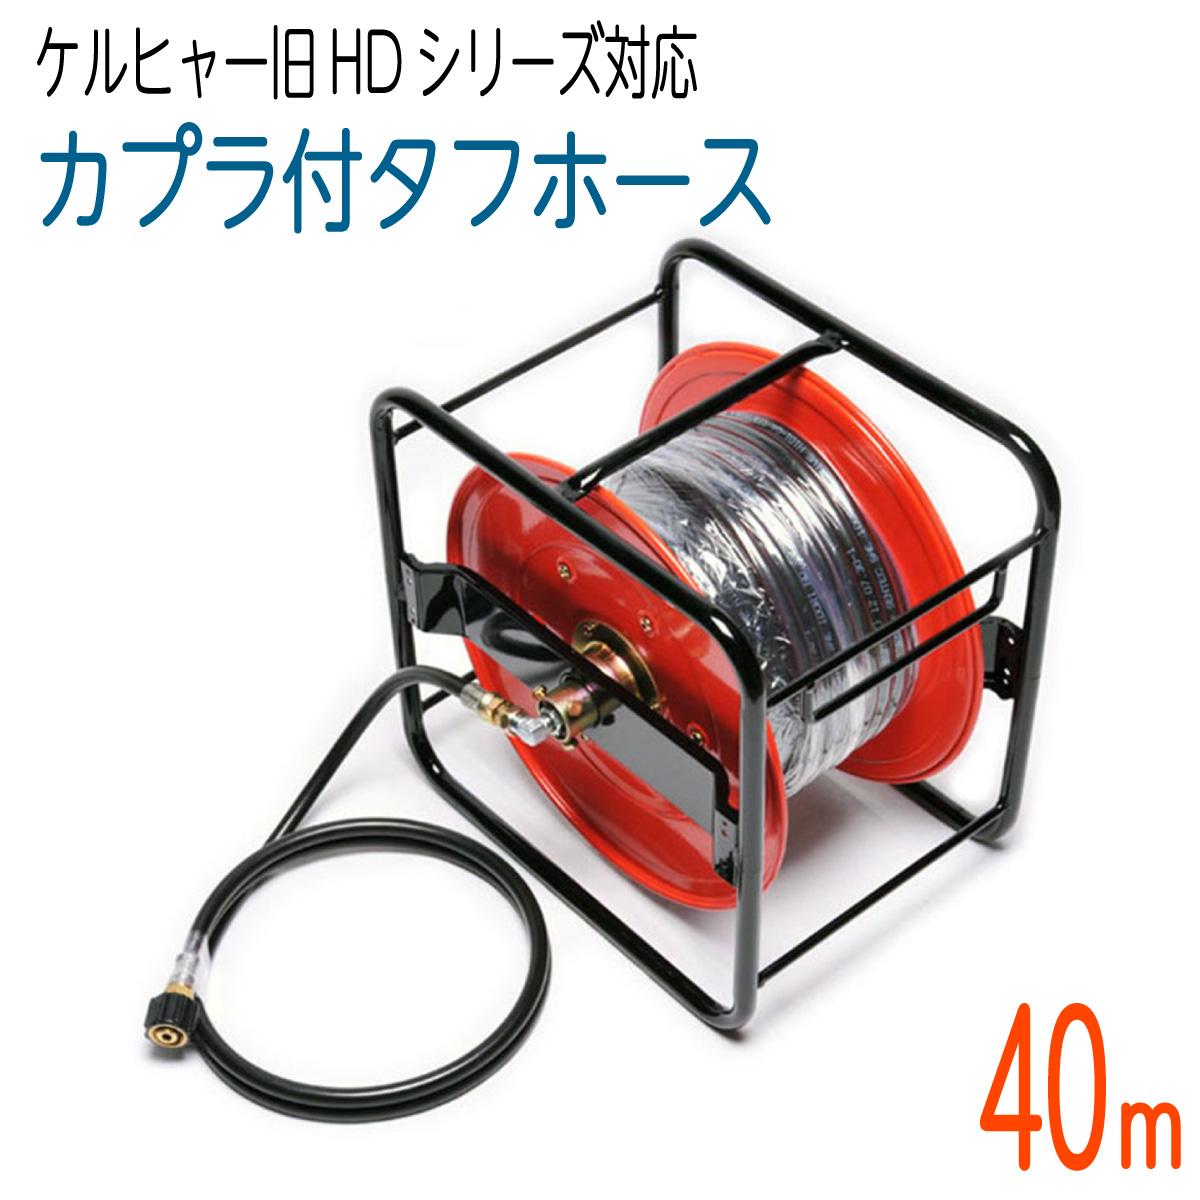 40Mリール巻き ケルヒャーHDシリーズ互換両端メス金具 お洒落 日本正規代理店品 タフホース 高圧洗浄機ホース